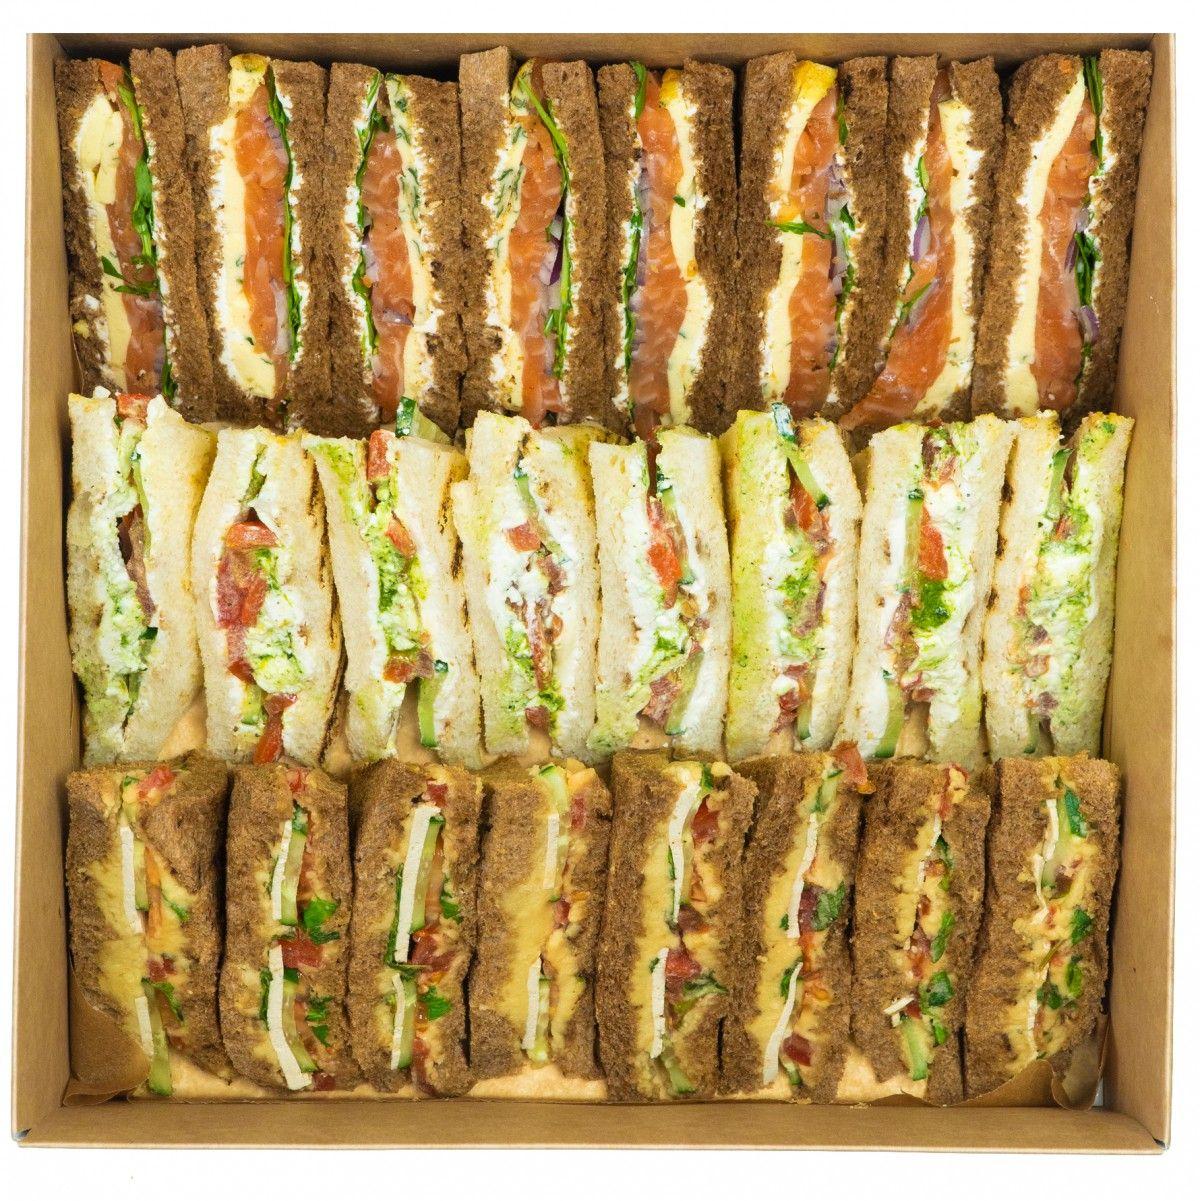 Sandwich vegetarian box фото 1